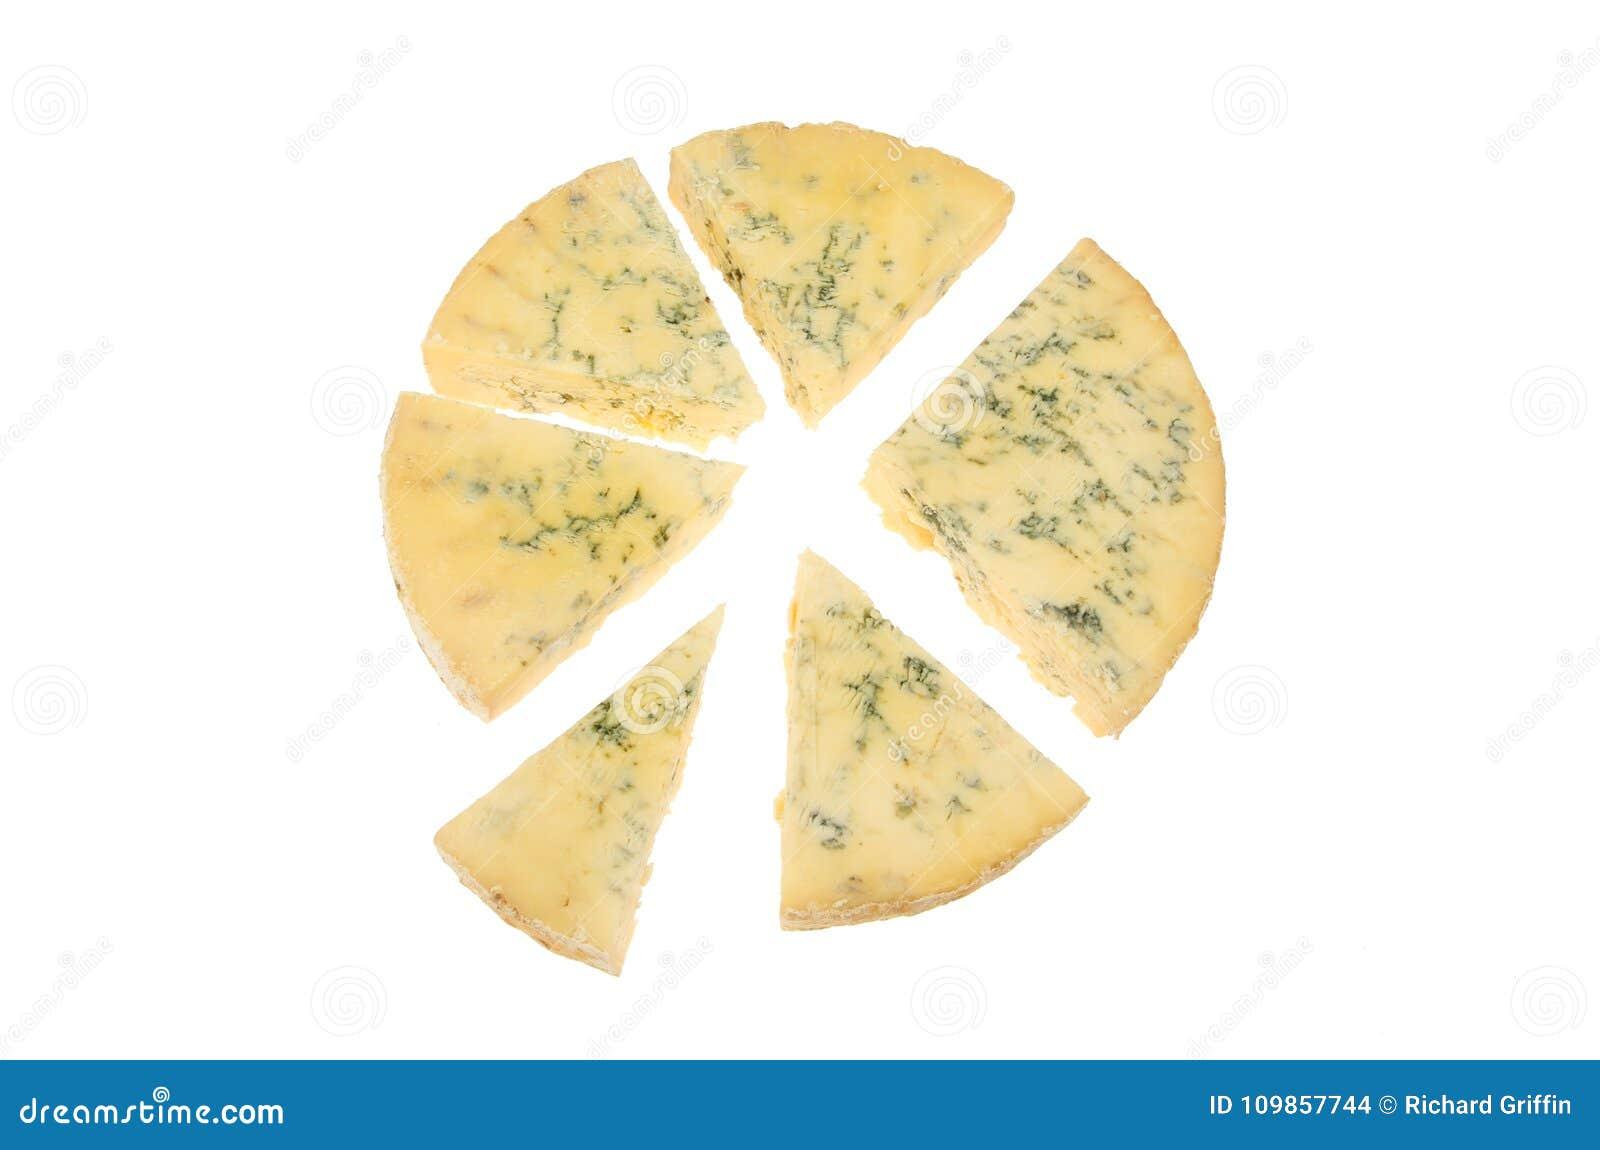 Stilton cheese pie chart